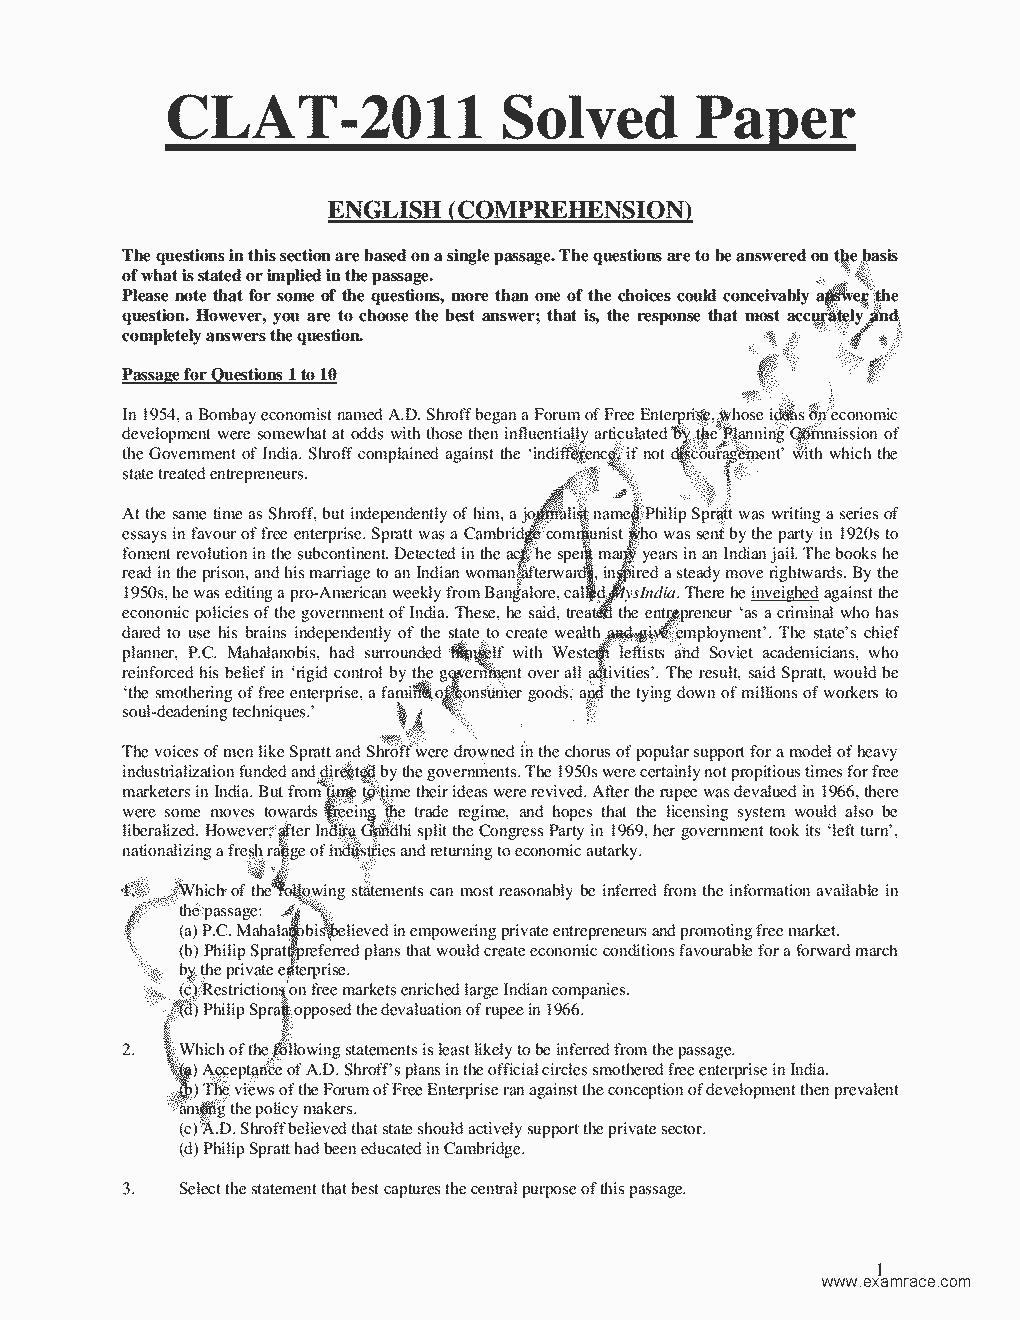 CLAT Solved Paper 2011- Translation in Hindi, Kannada, Malayalam